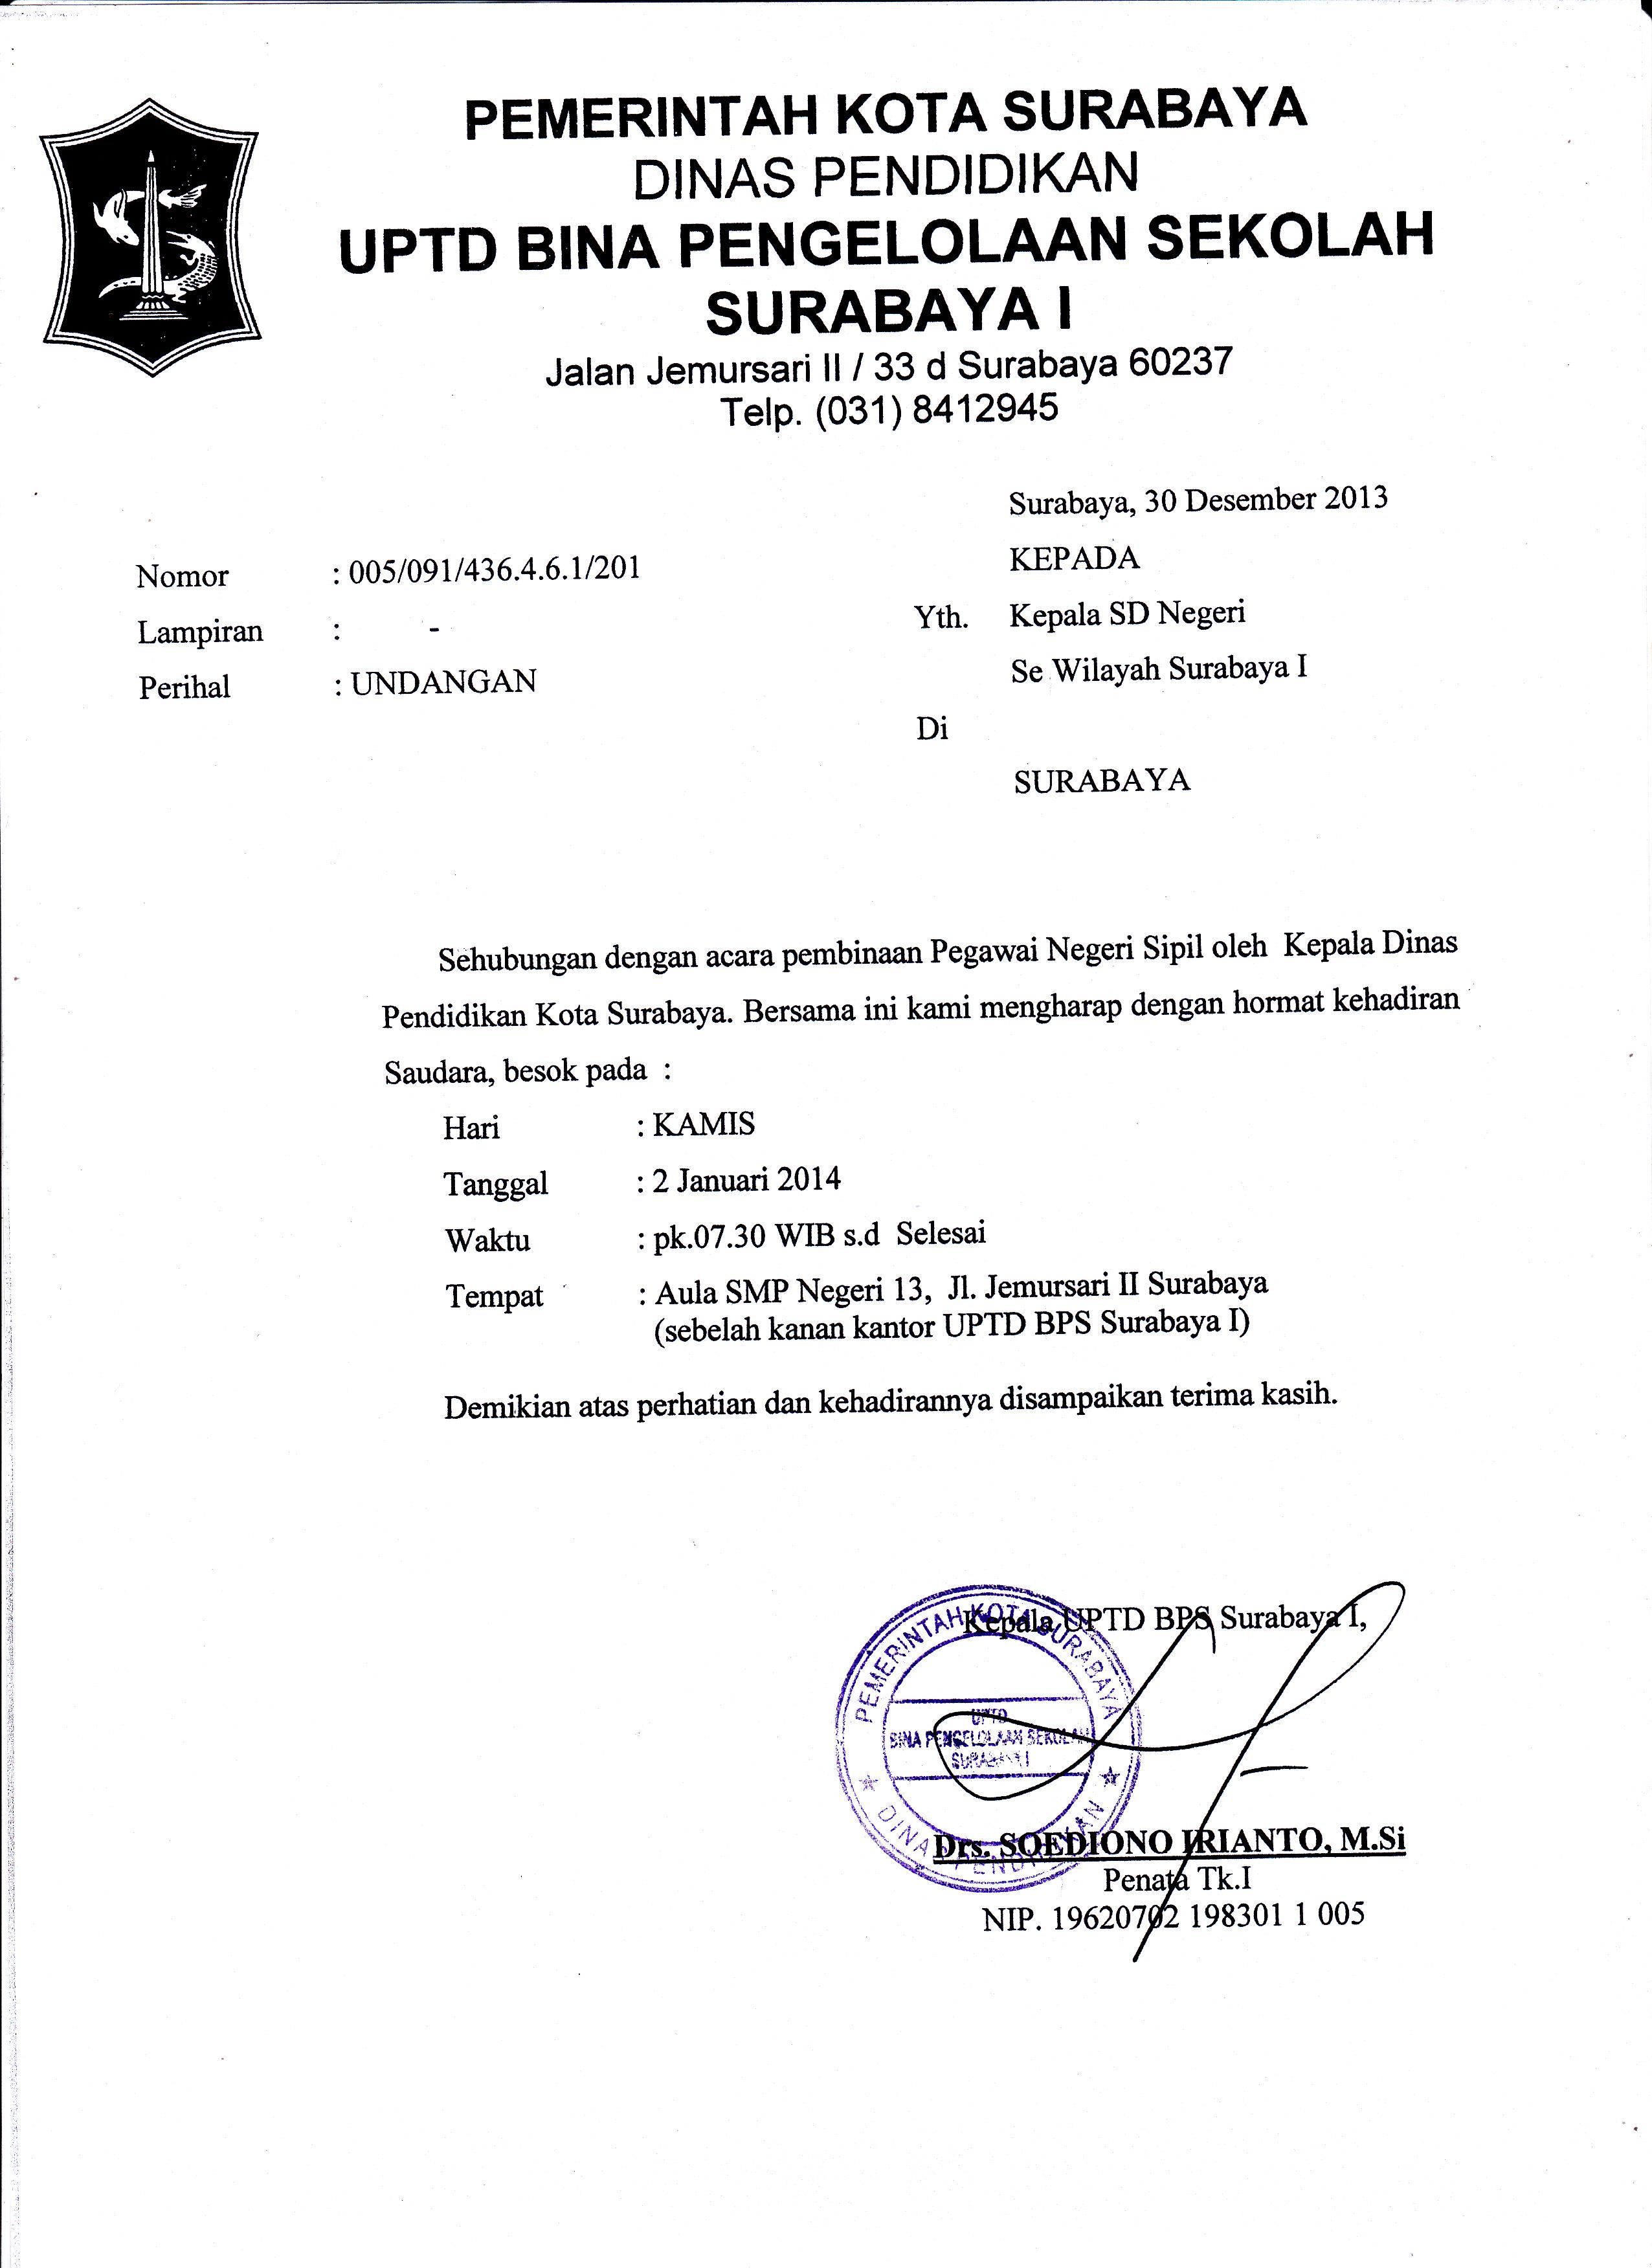 Undangan Pembinaan Uptd Bps Surabaya 1